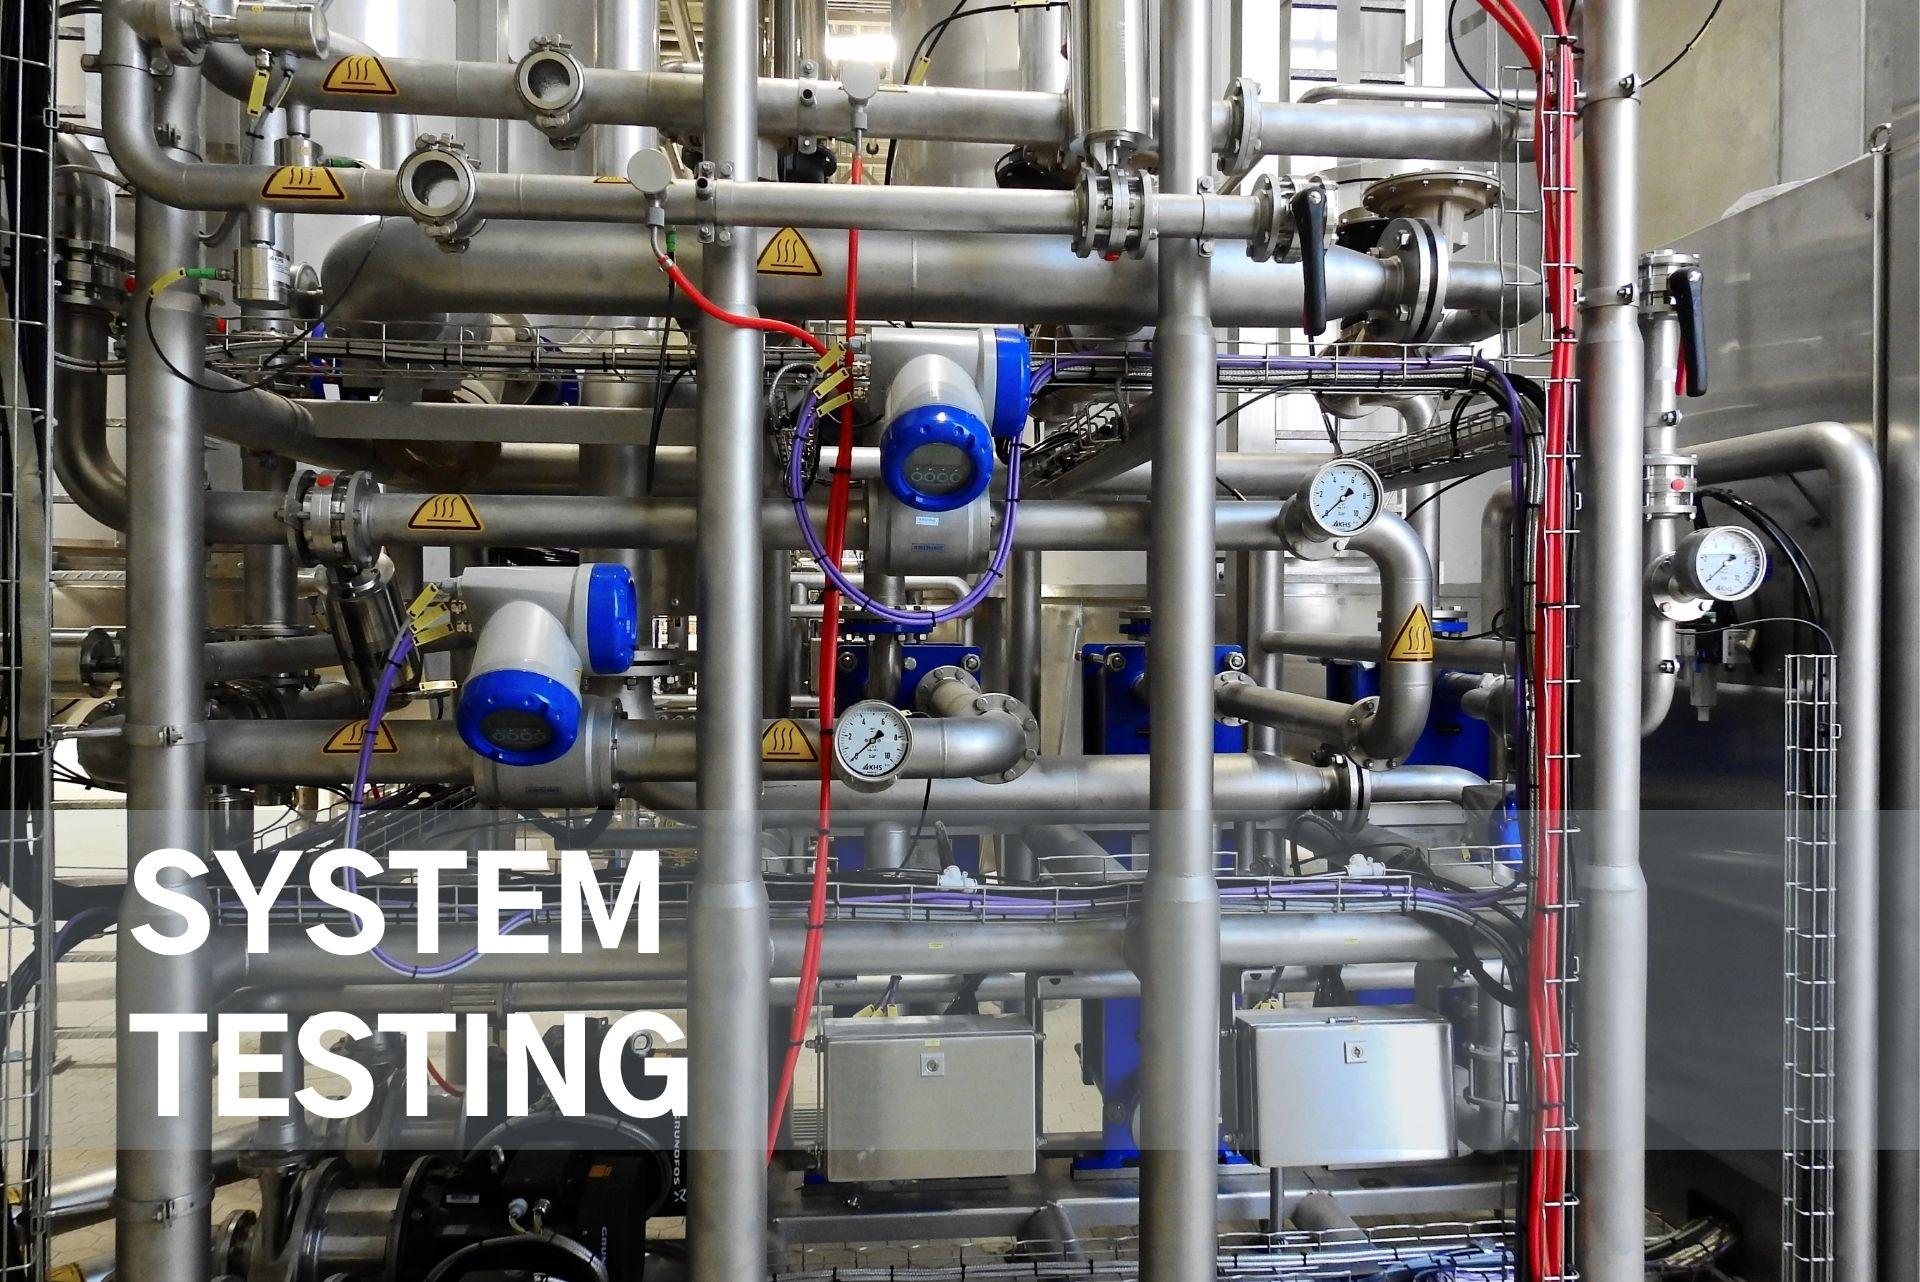 System Performance Testing